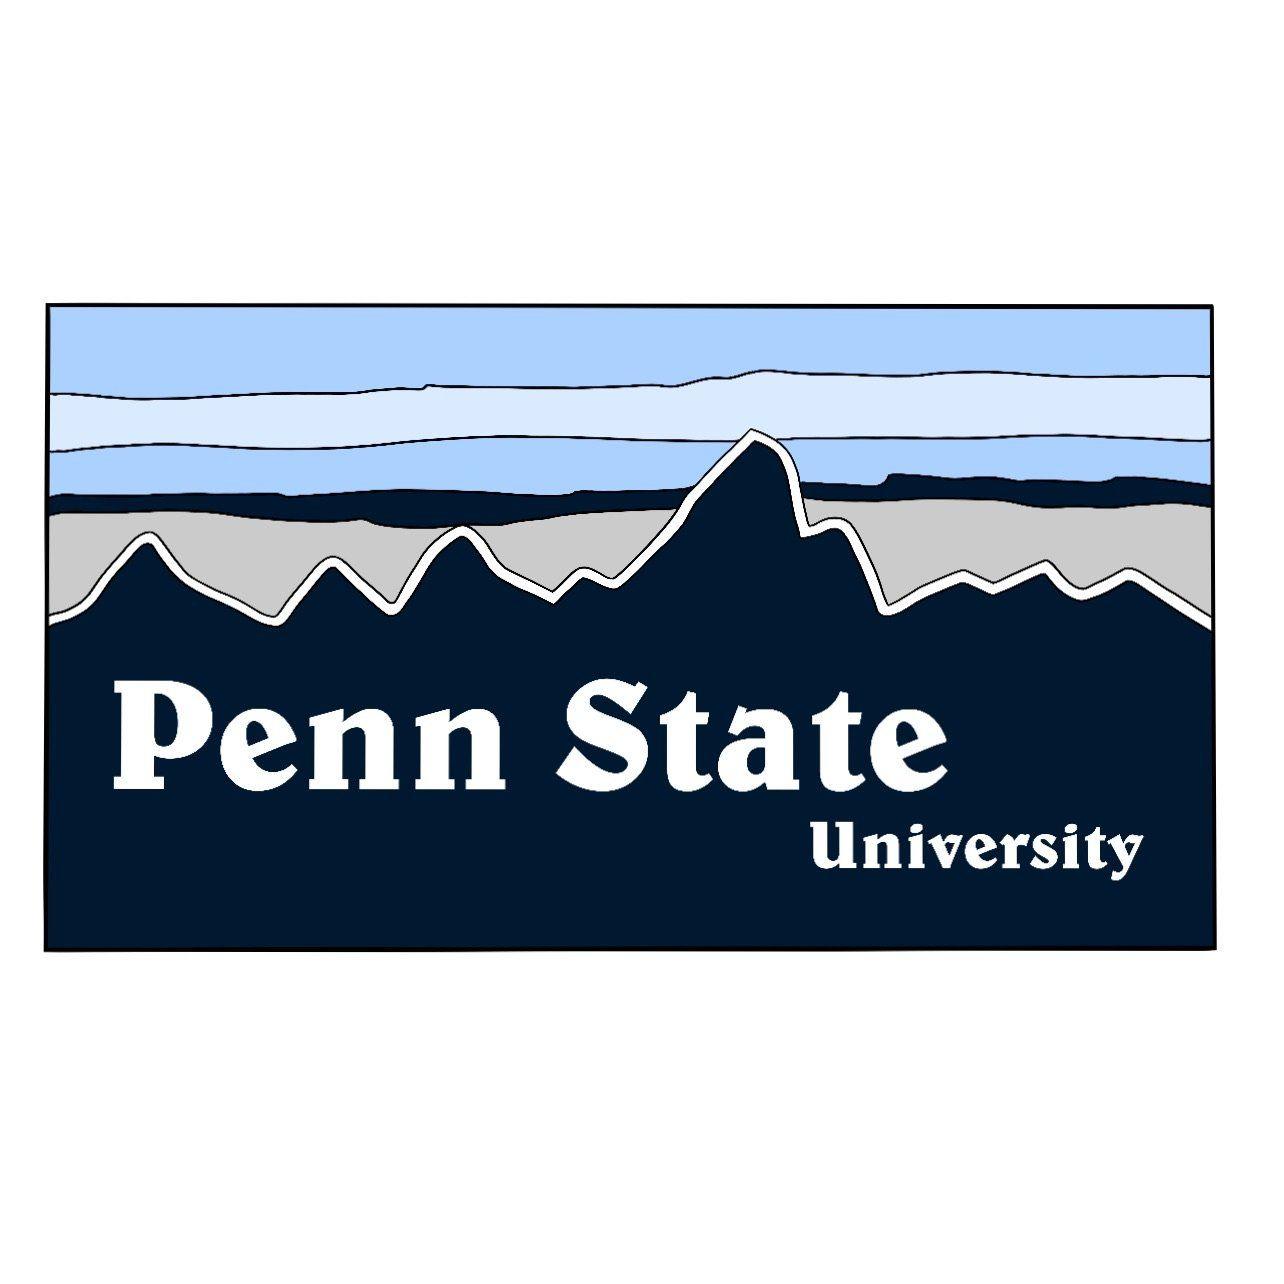 Penn State Patagonia In 2020 Penn State Pennsylvania State University Penn State University